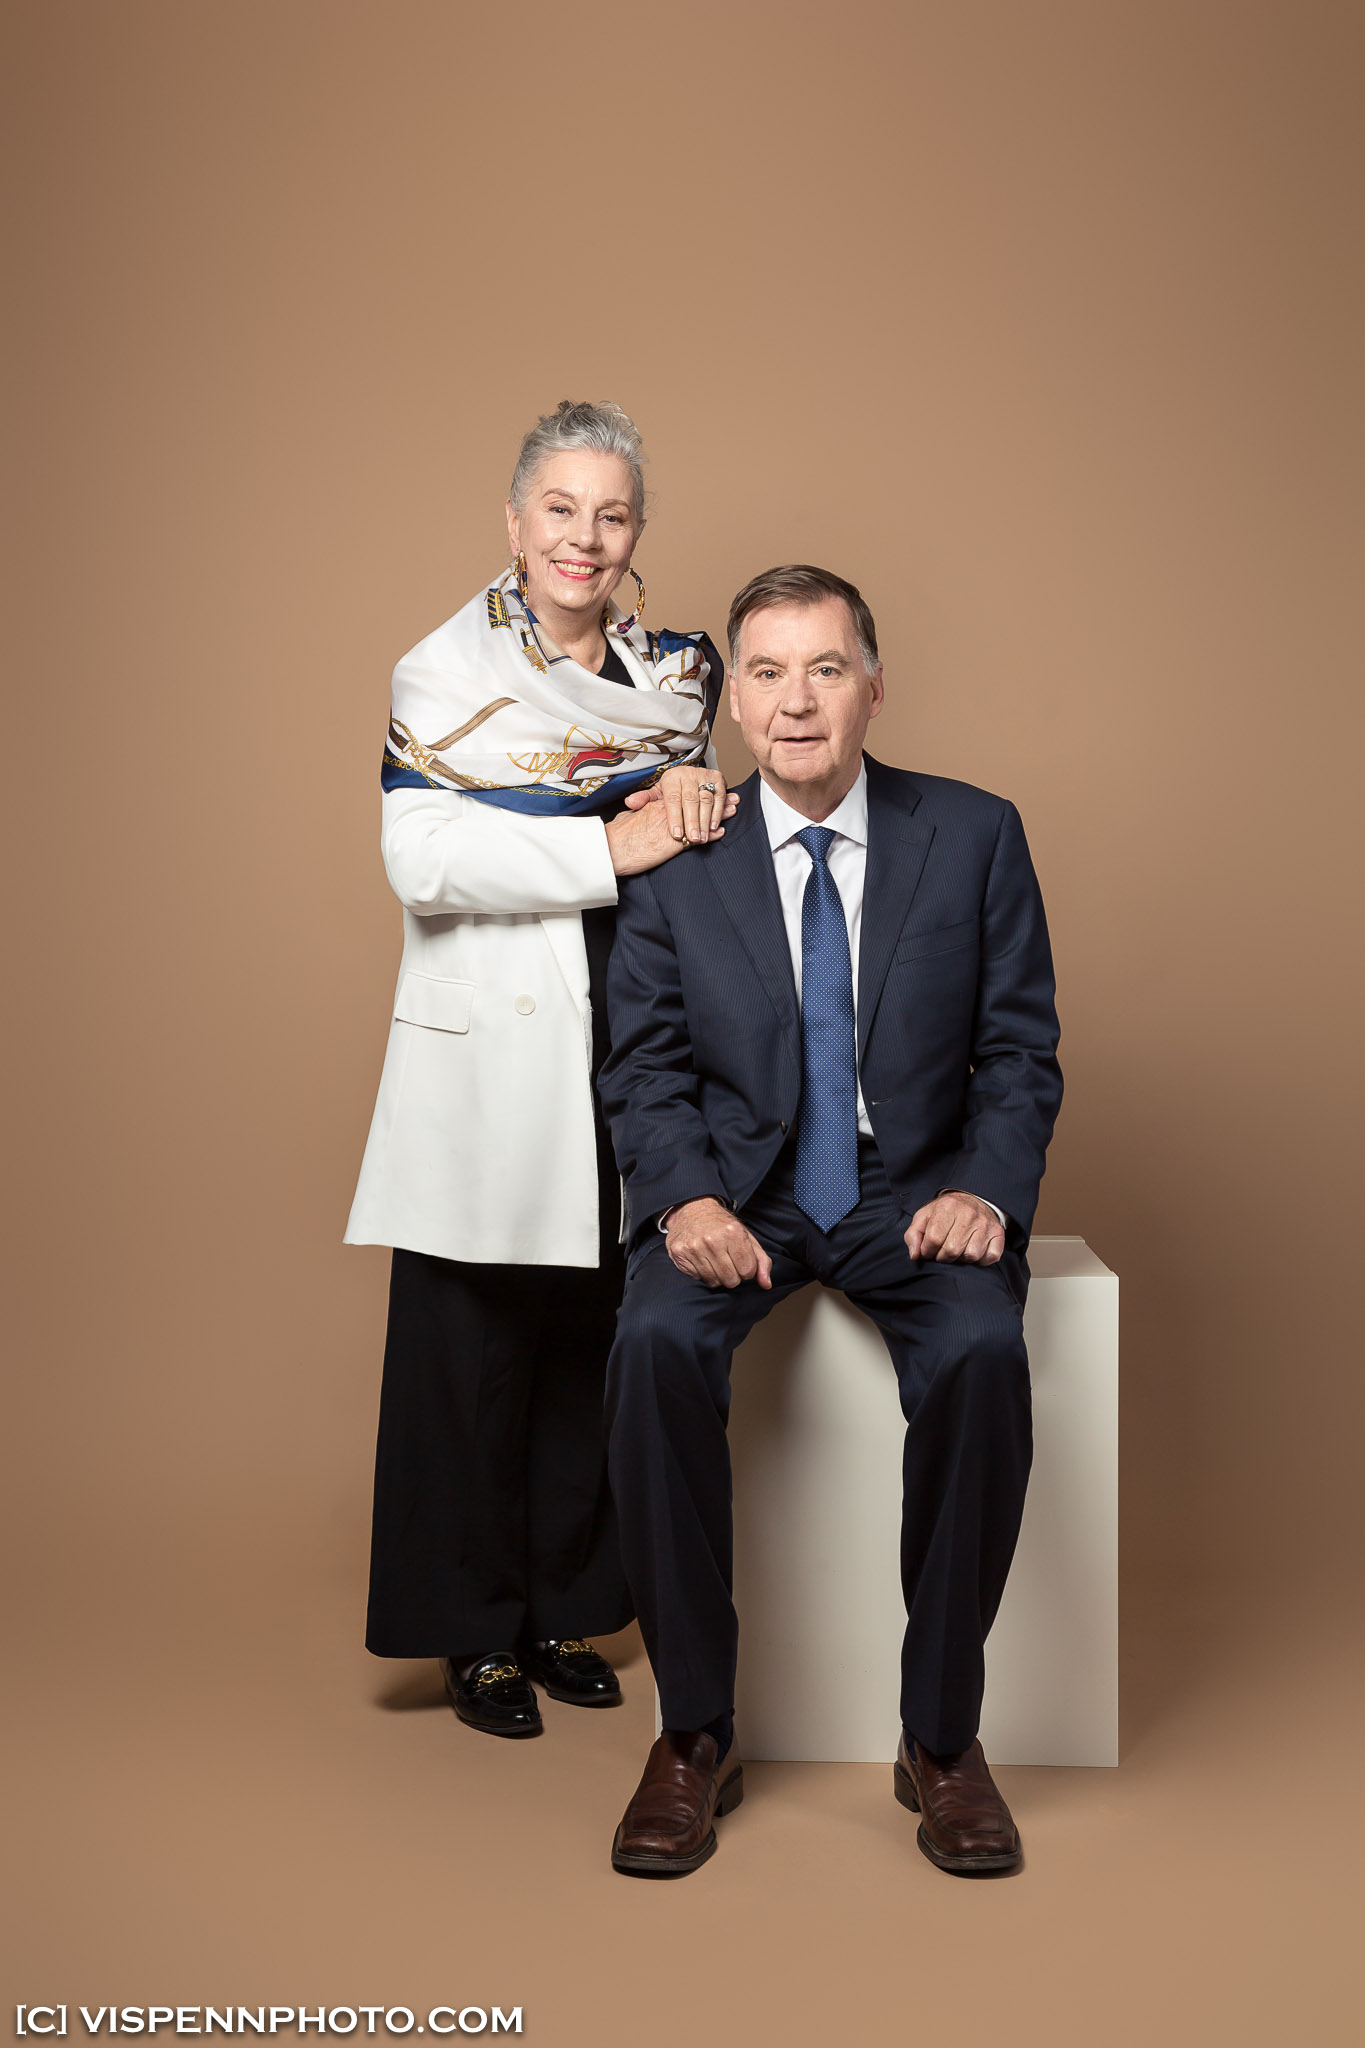 PRE WEDDING Photography Melbourne VISPENN 墨尔本 婚纱照 结婚照 婚纱摄影 Barbara 1979 VISPENN